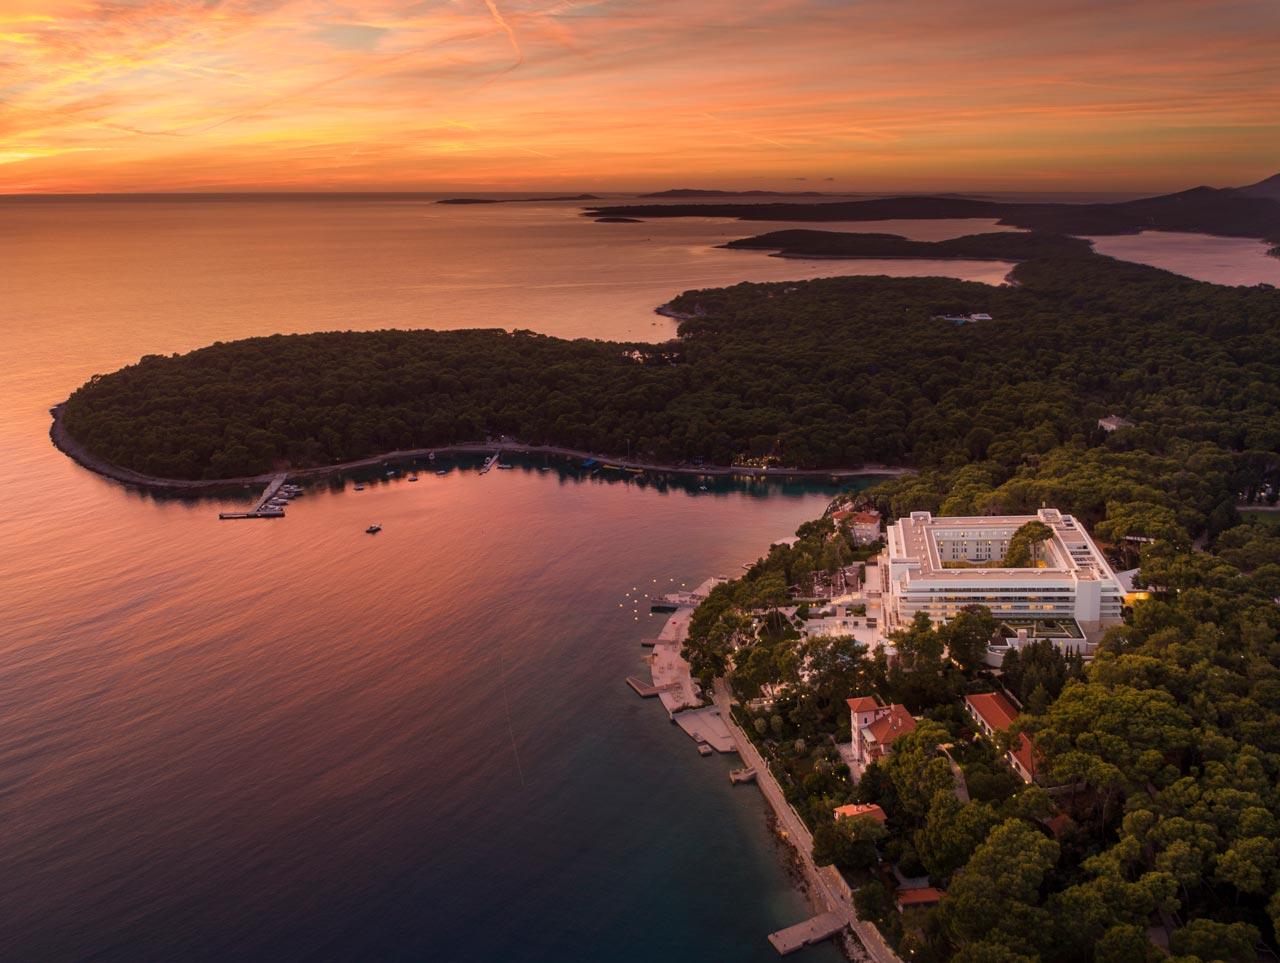 Fotografija hotela iz zraka